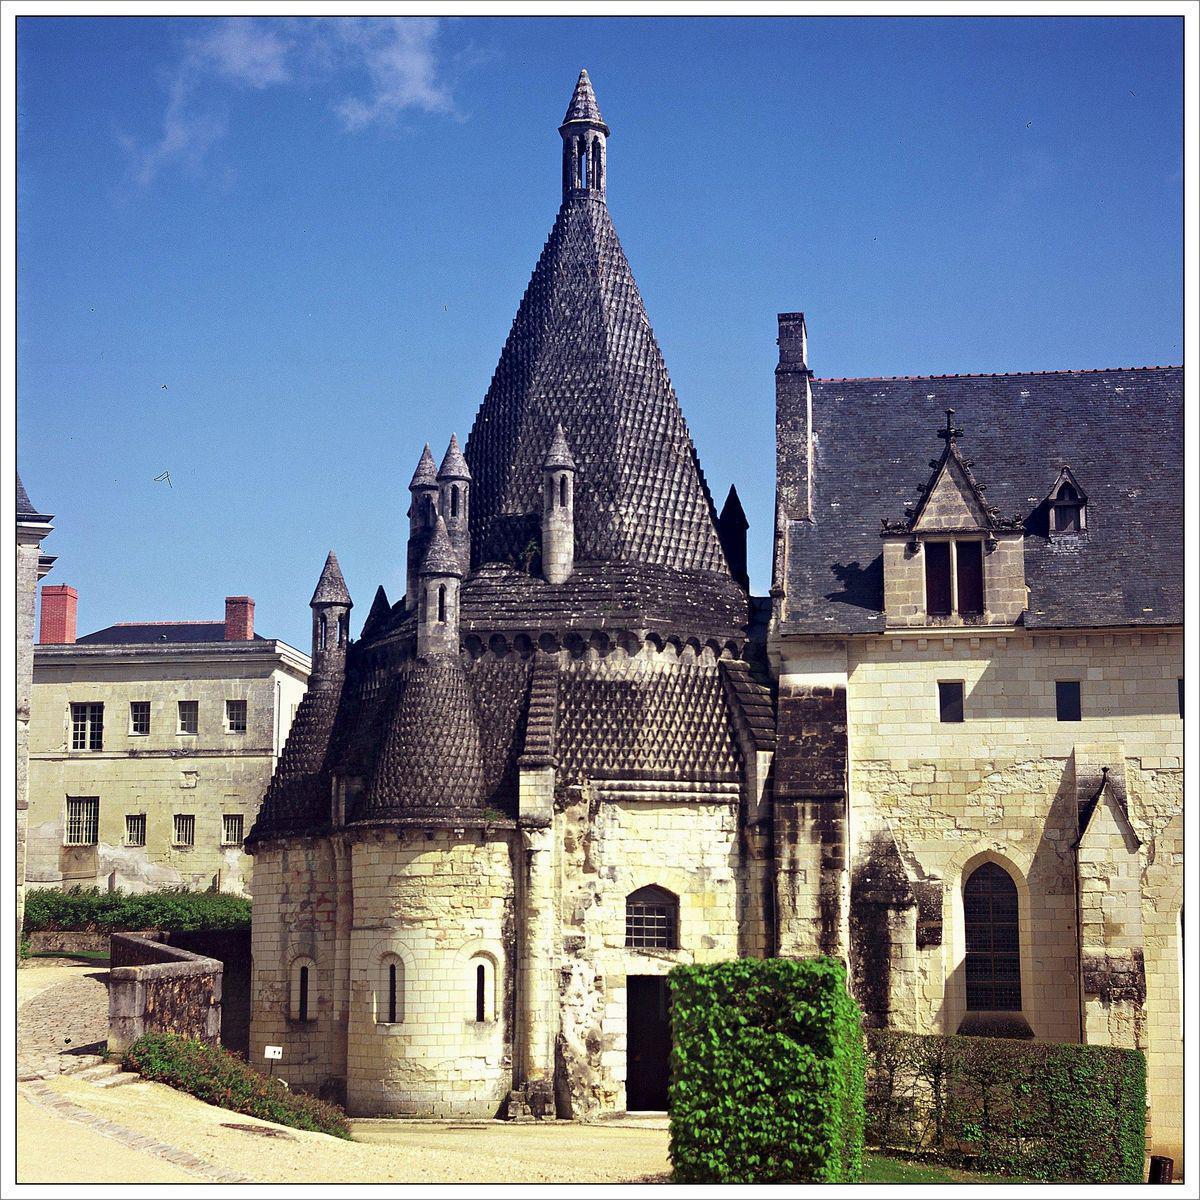 ABBAYE ROYALE DE FONTEVRAUD_Fontevraud-l'Abbaye (1)